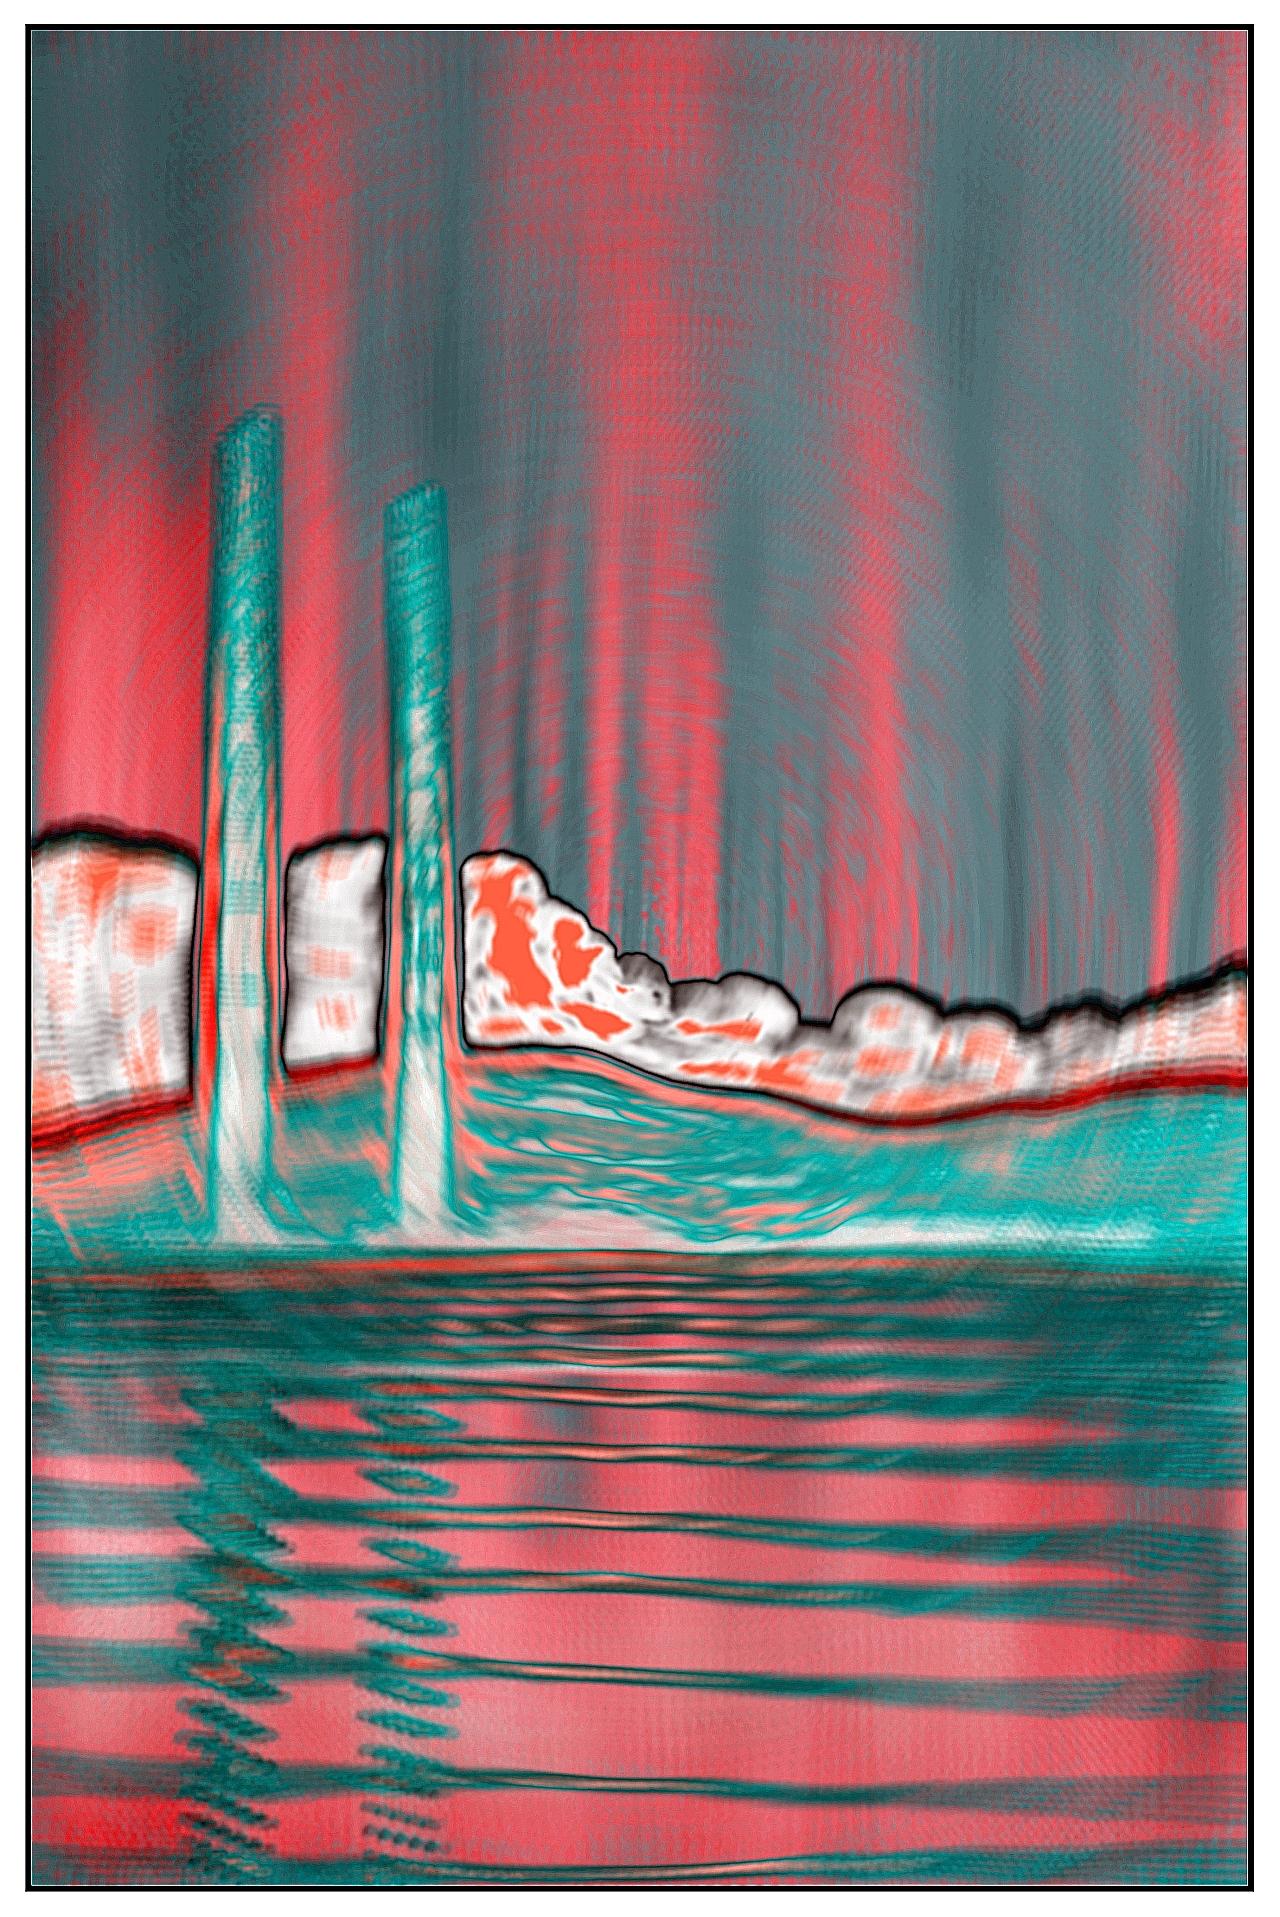 Poolbeg Towers Neon Cloud Pink Swirl by Orfhlaith Egan